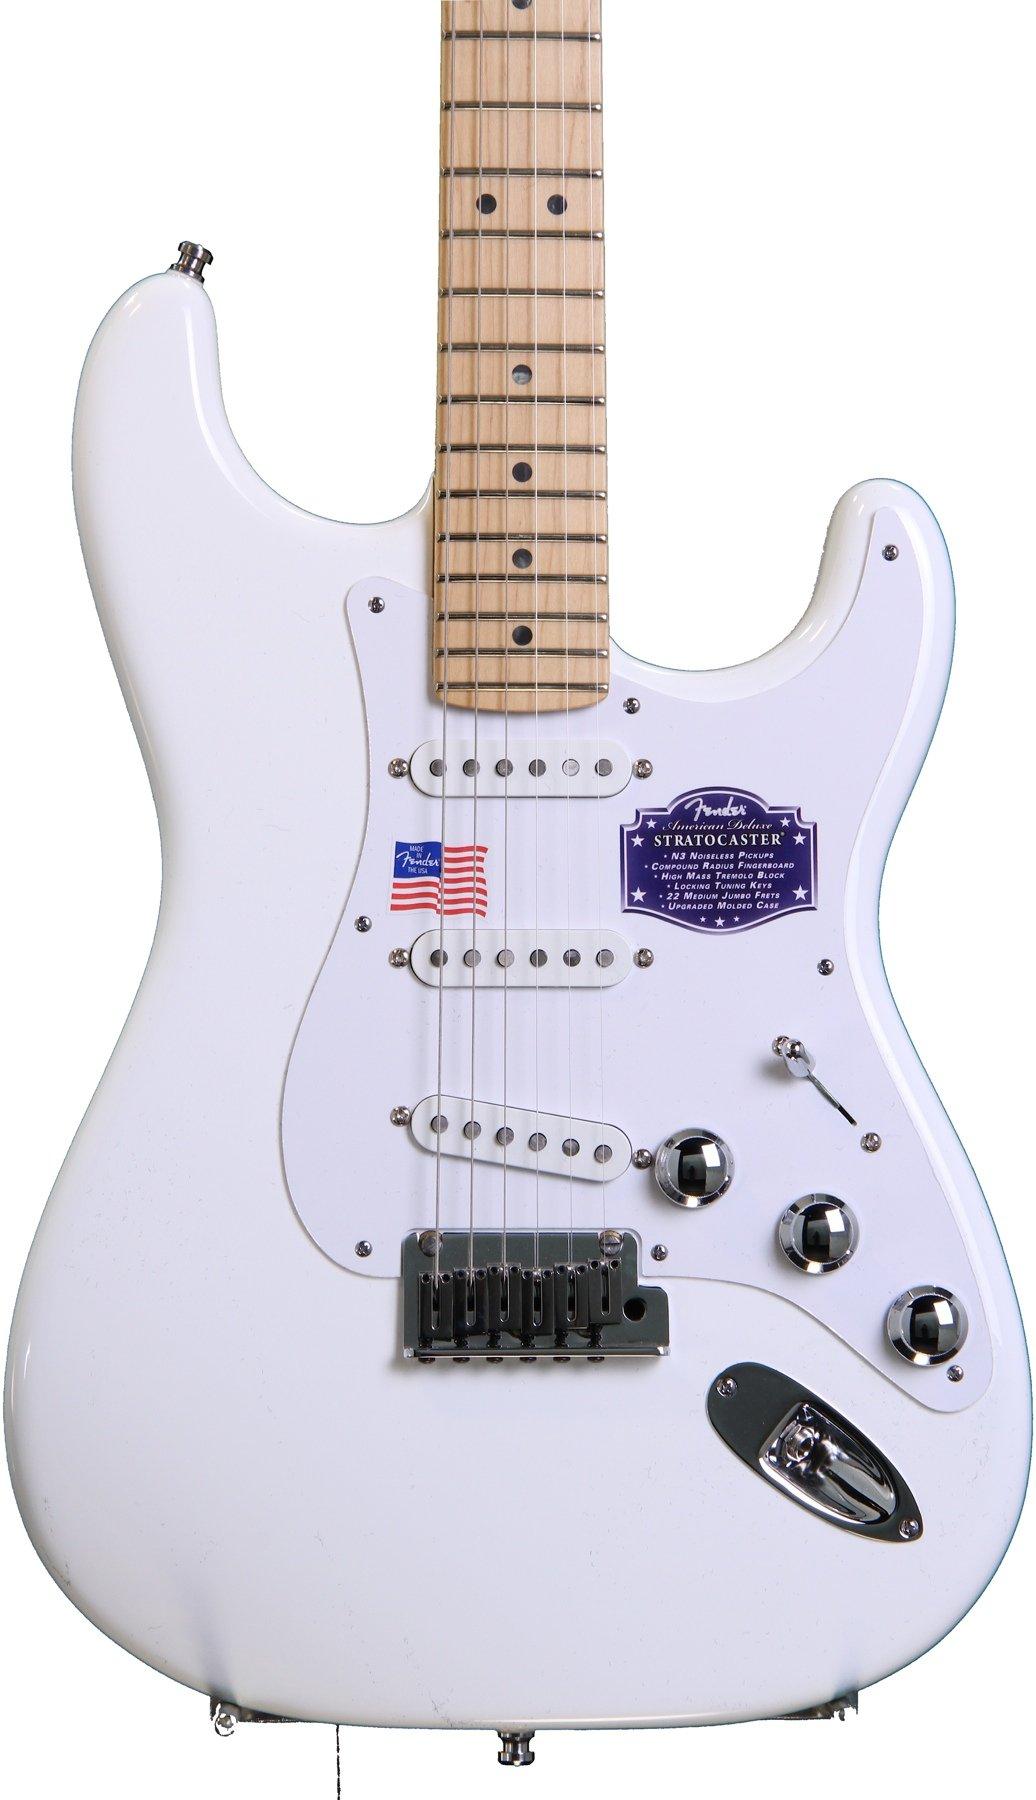 Ziemlich Fender Squier Stratocaster 2 Einzelspule 1 Humbucker ...